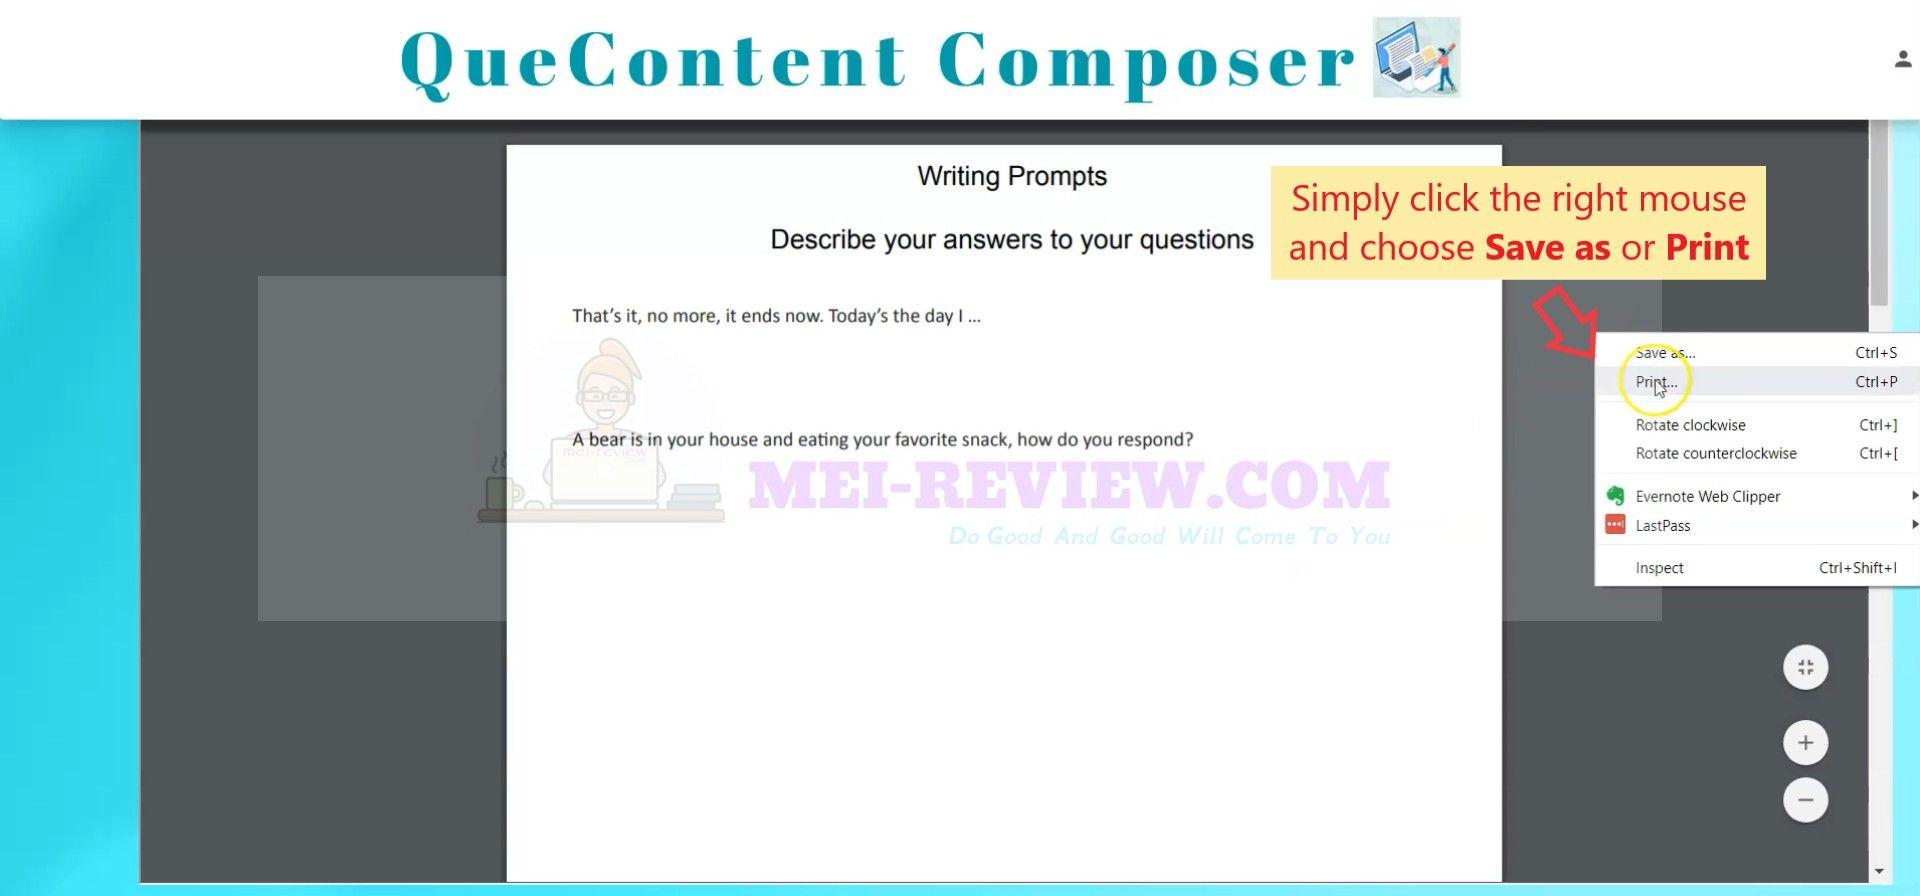 QueContent-Composer-how-to-use-8